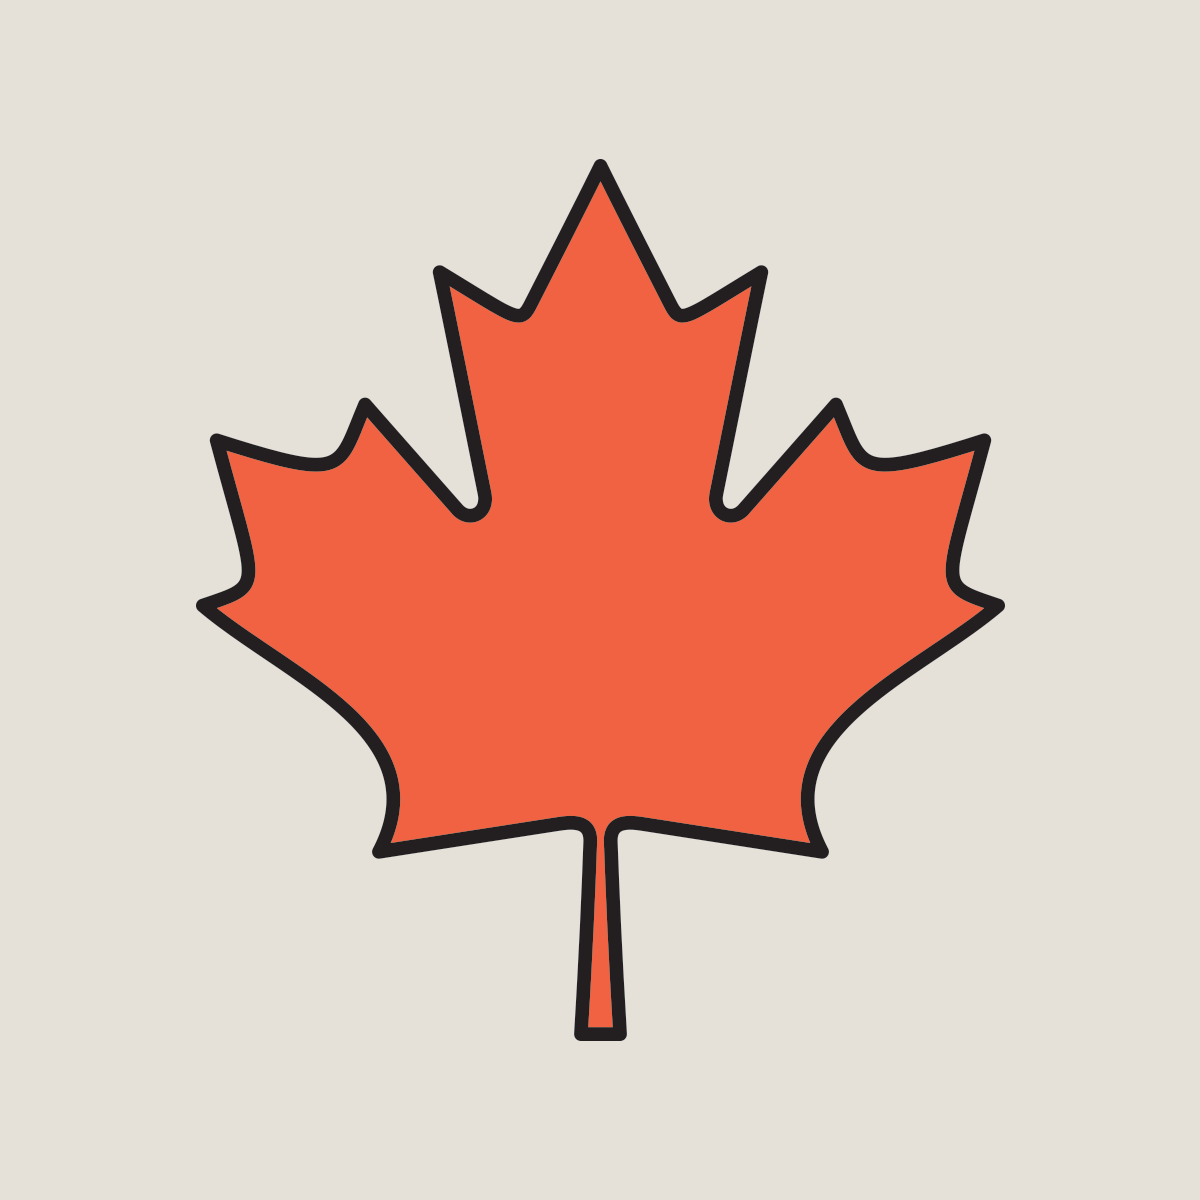 113 canadian symbols